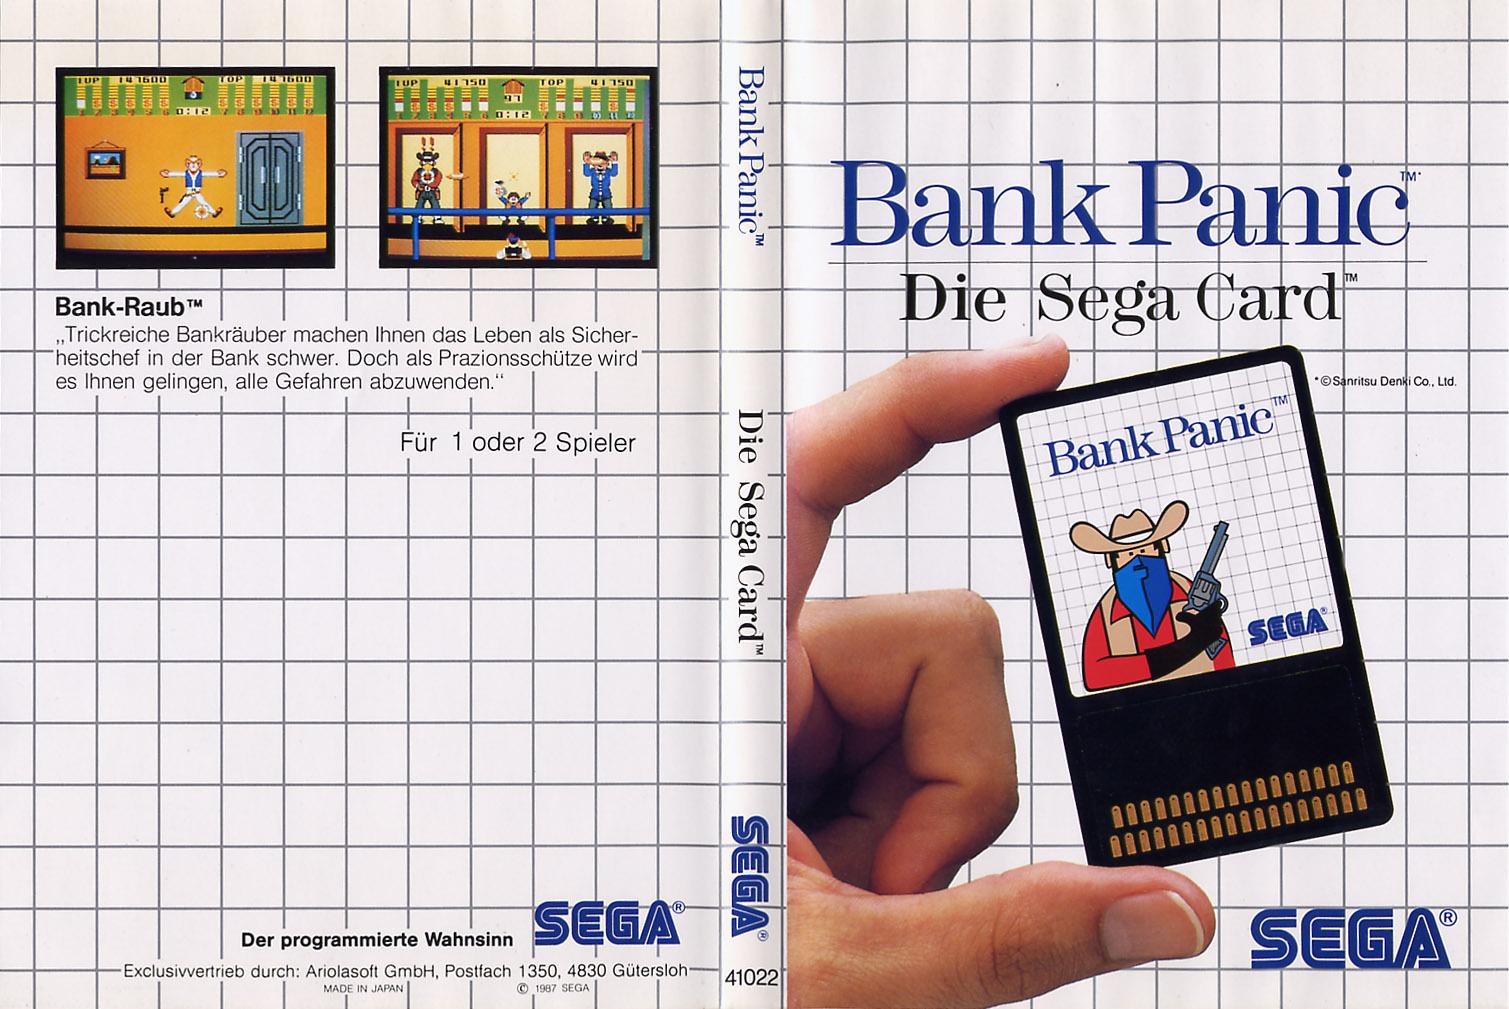 [Master System] Les Sega Card Pal BankPanic-SMS-DE-Card